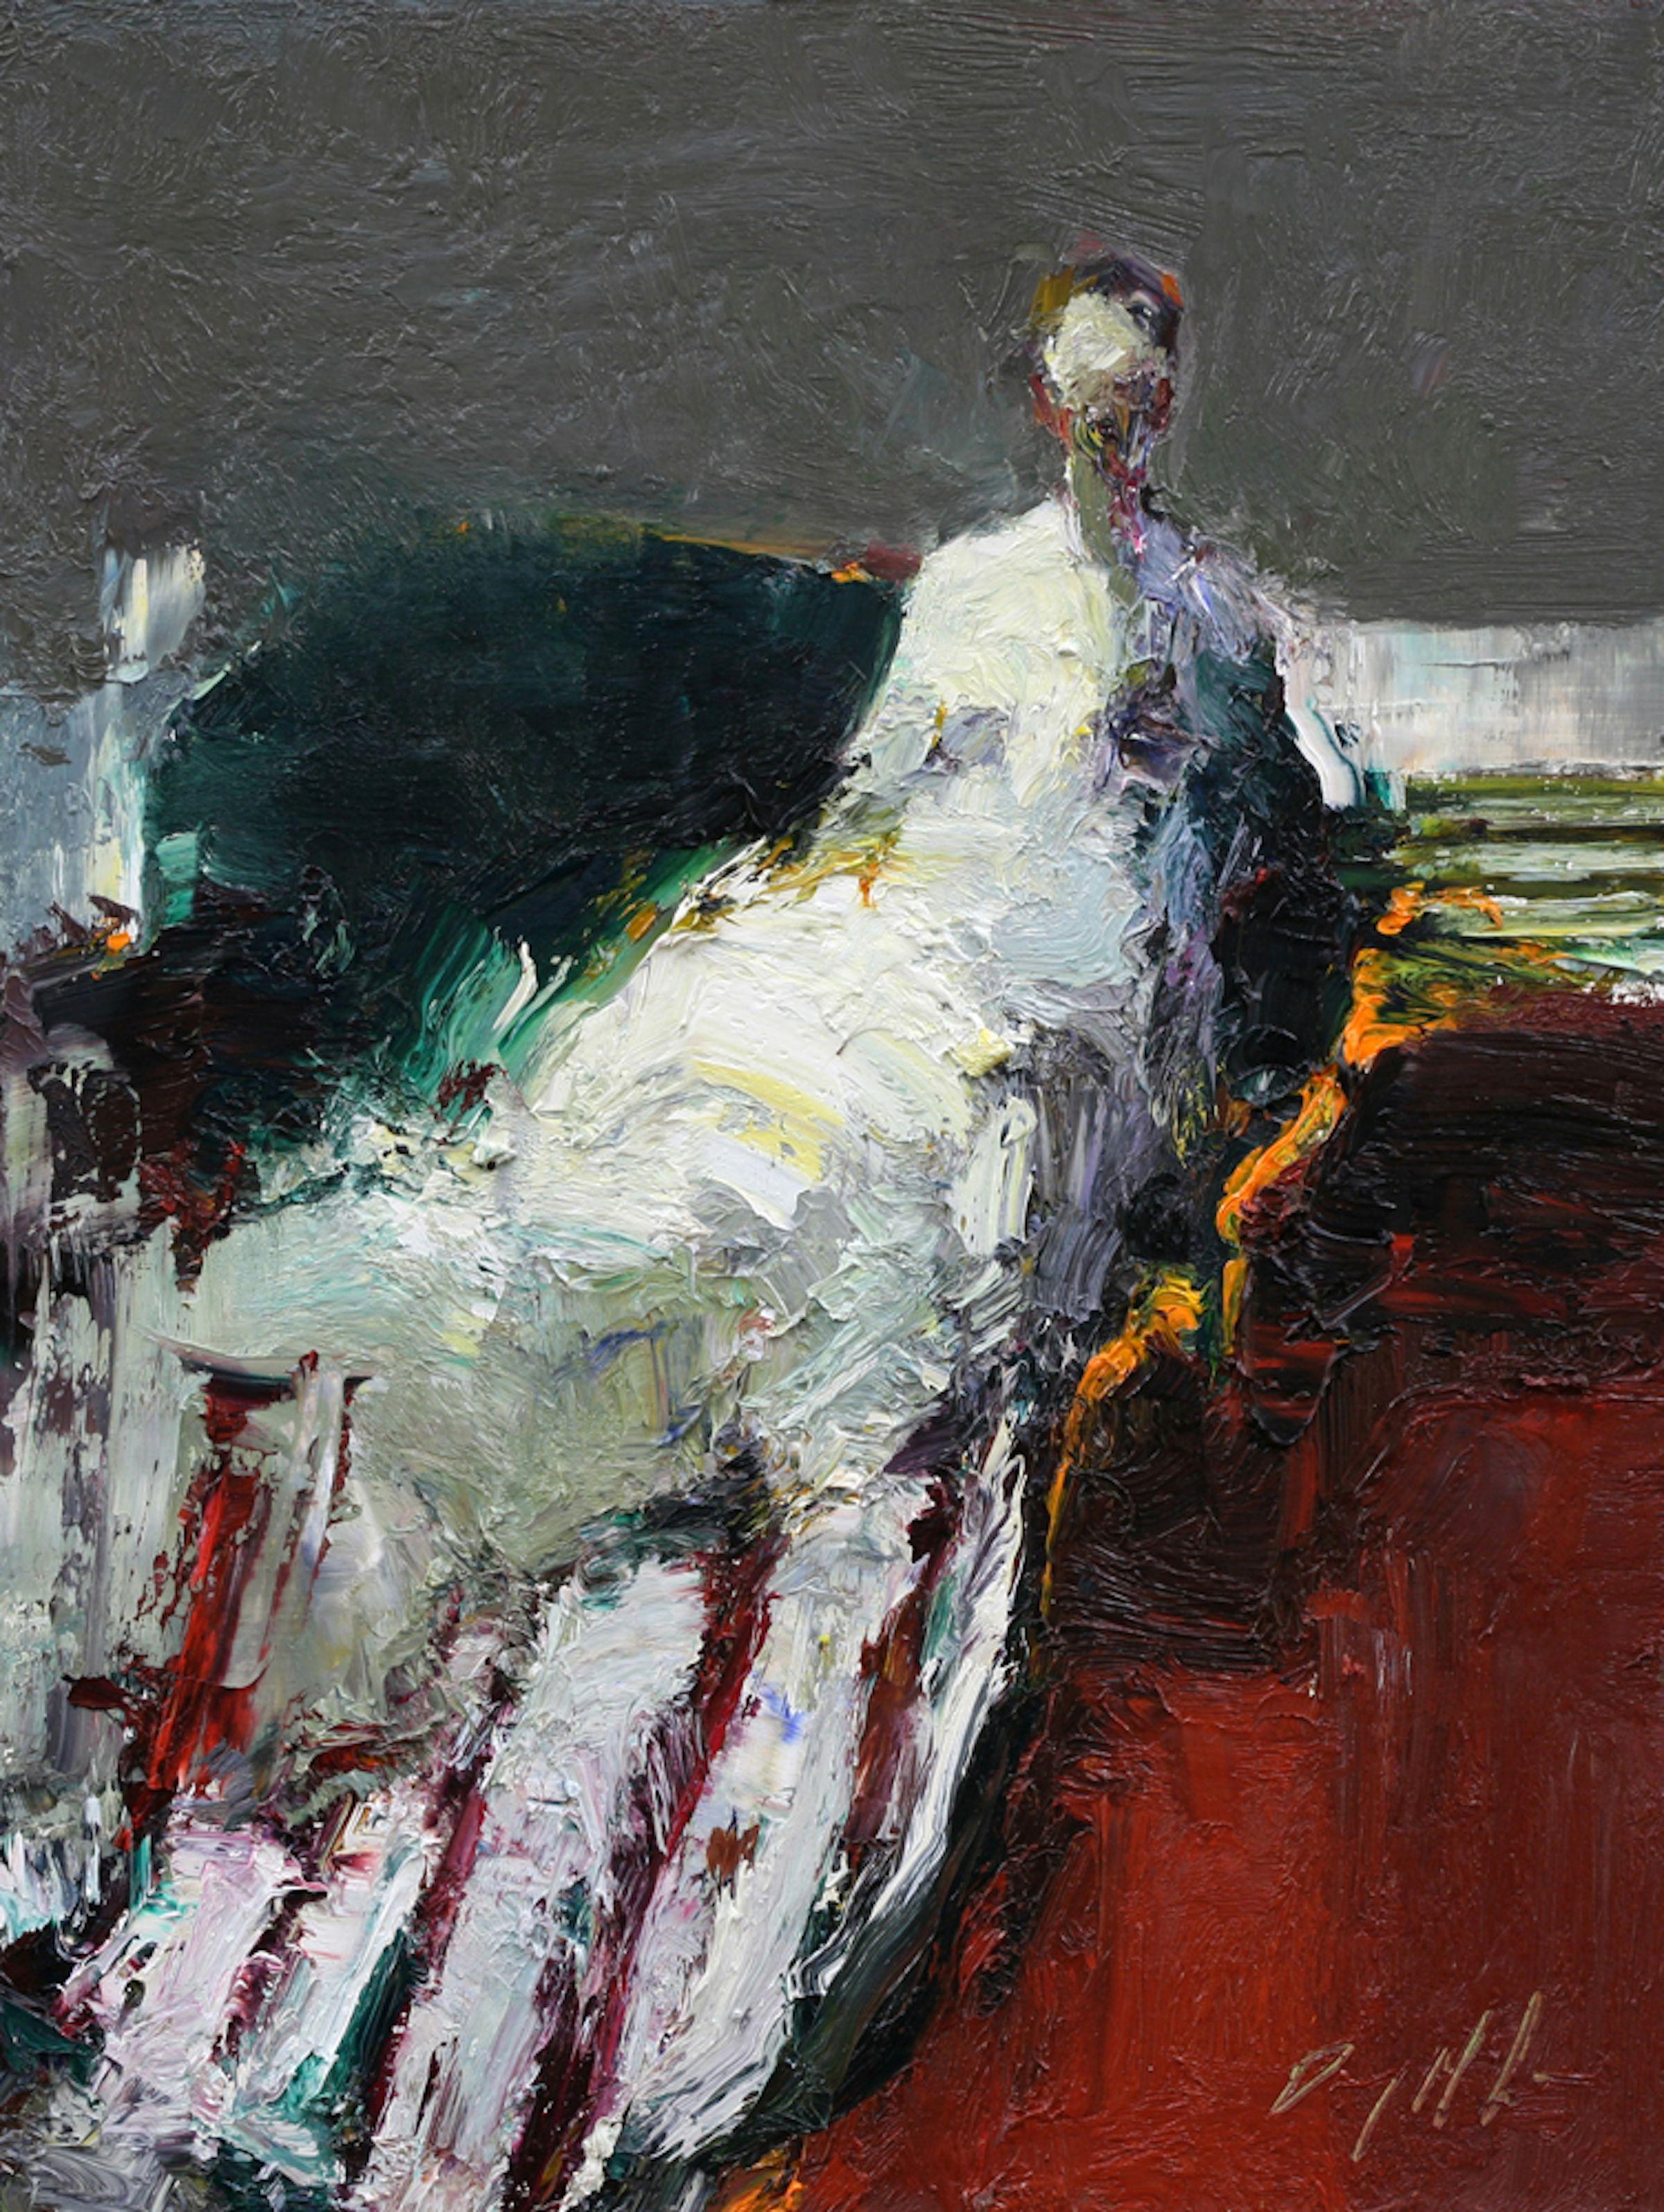 Danny McCaw, 'Stripes', 12 x 9, Oil on Panel